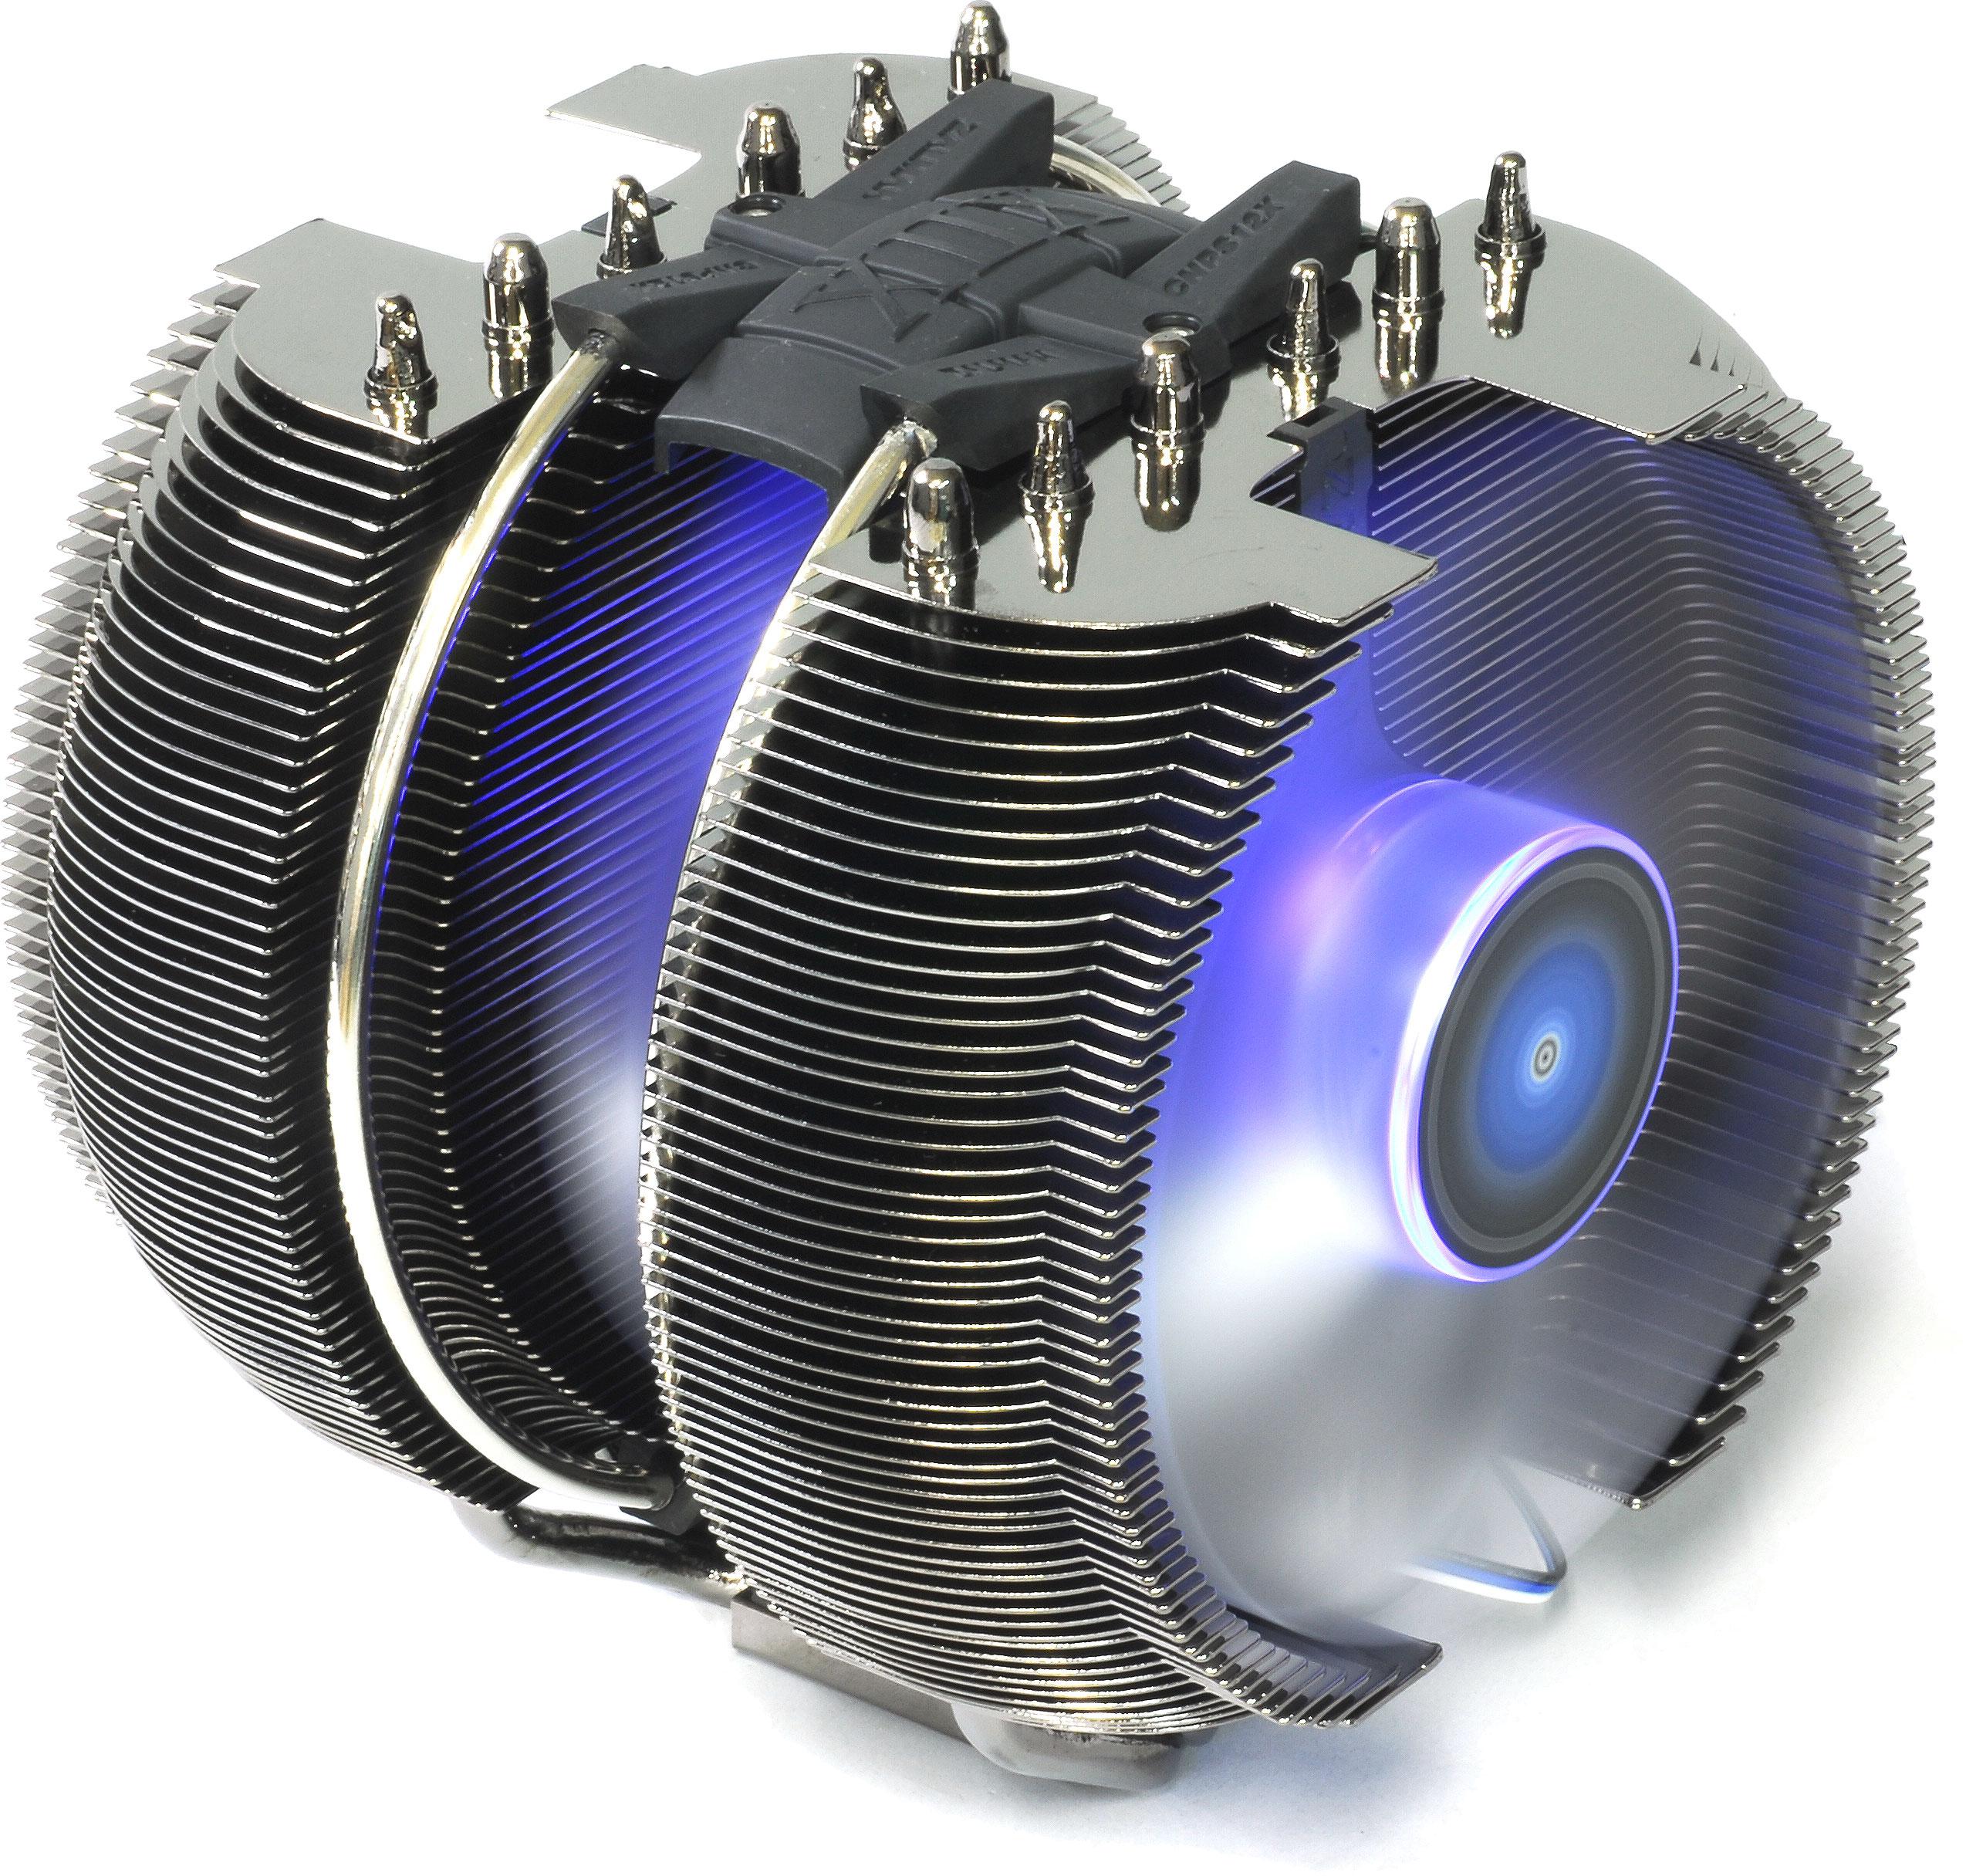 CNPS12X Ultimate Performance Triple Fan CPU Cooler